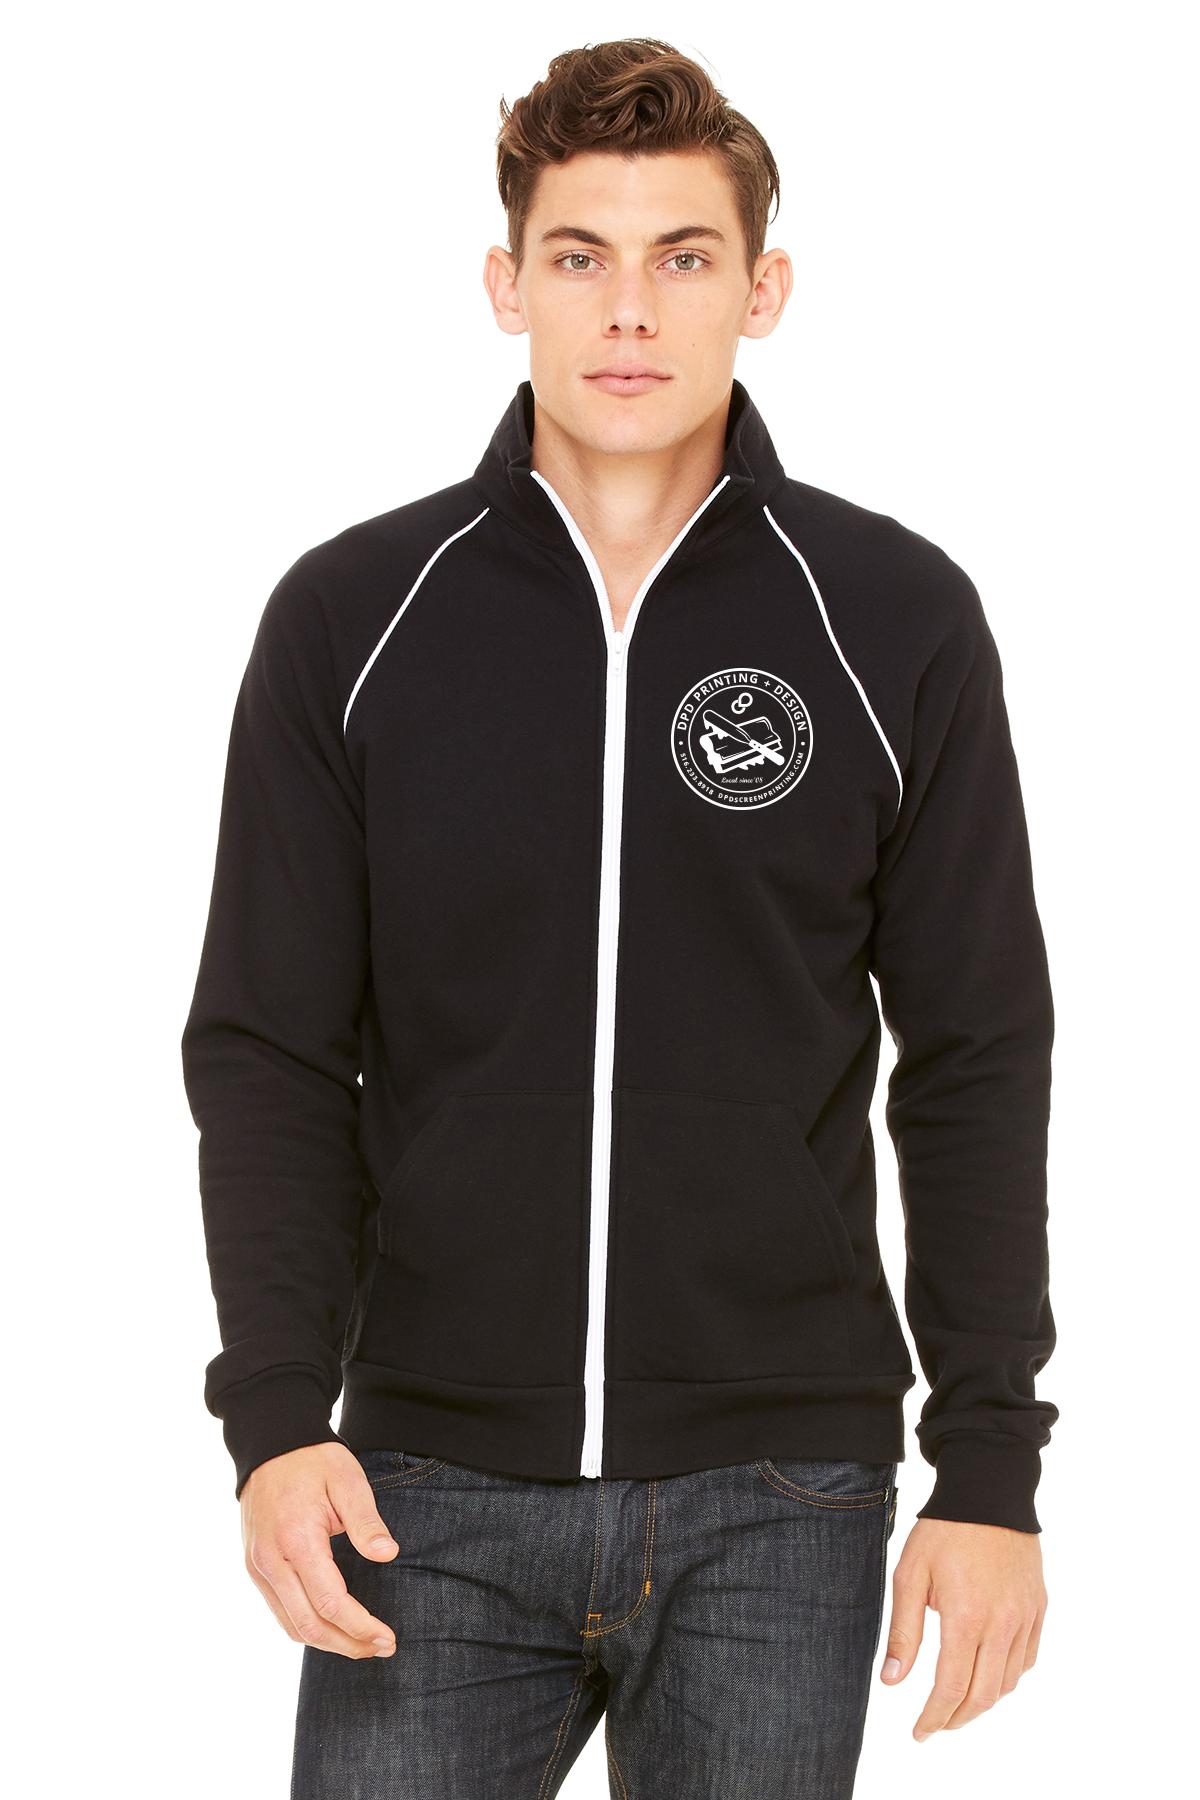 Jackets - Zip-up, Pullover, Rain